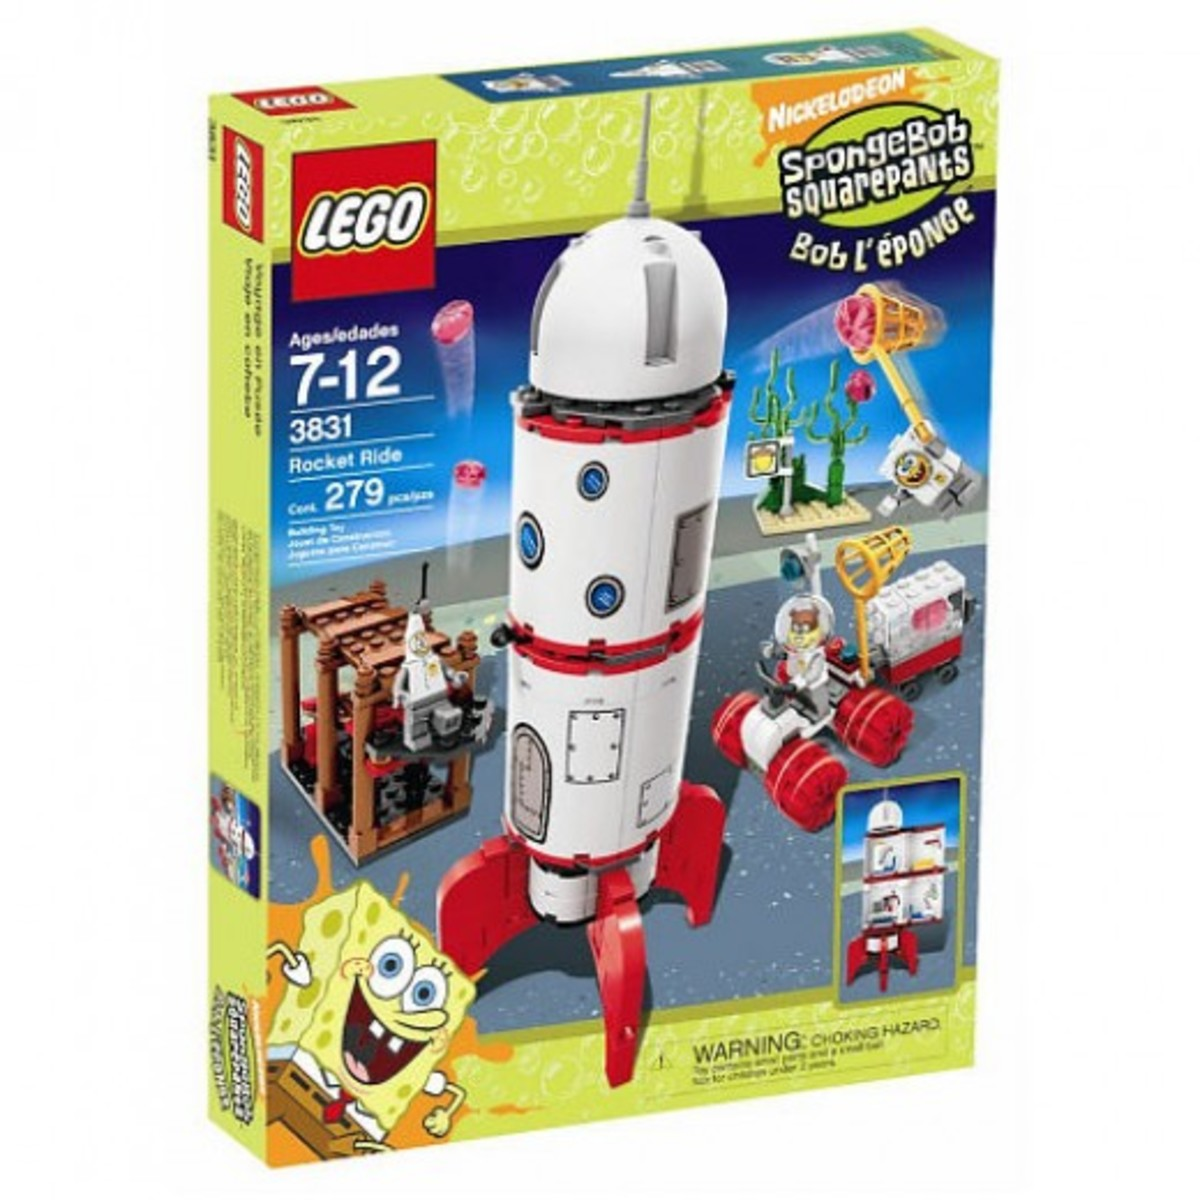 LEGO SpongeBob SquarePants Rocket Ride 3831 Box